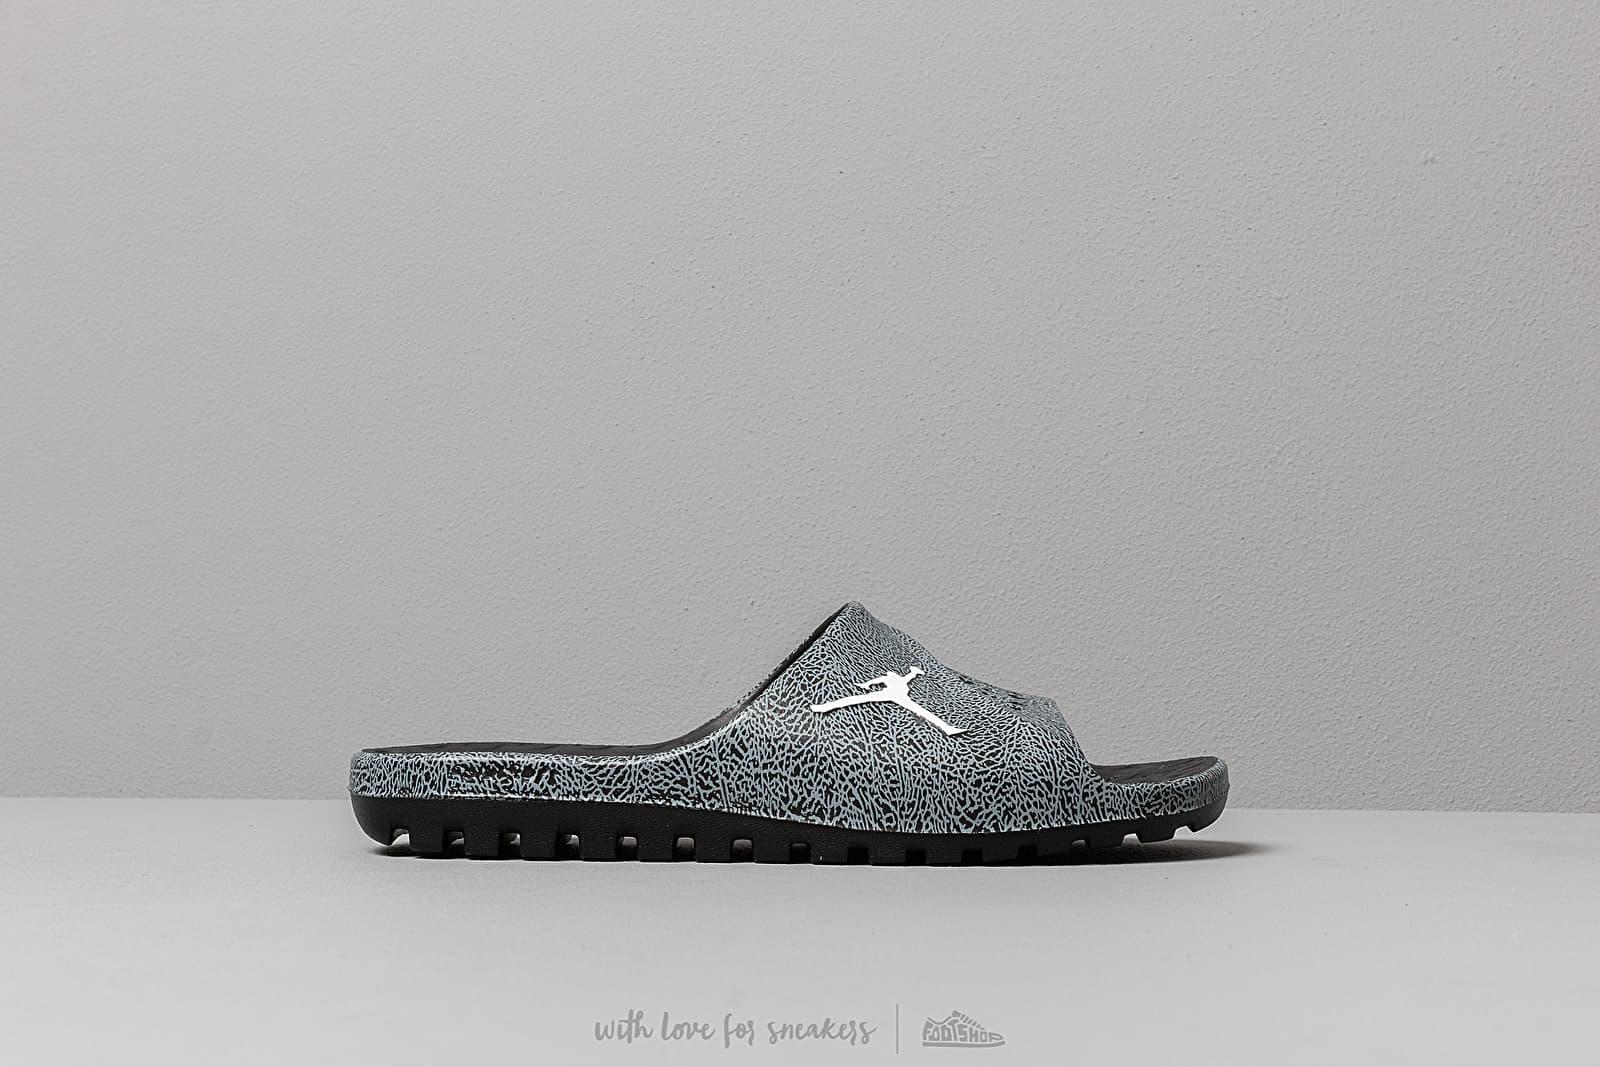 426ee16a66b3 Jordan Super.Fly Tm Sld 2 Grpc Black  White-Cool Grey at a